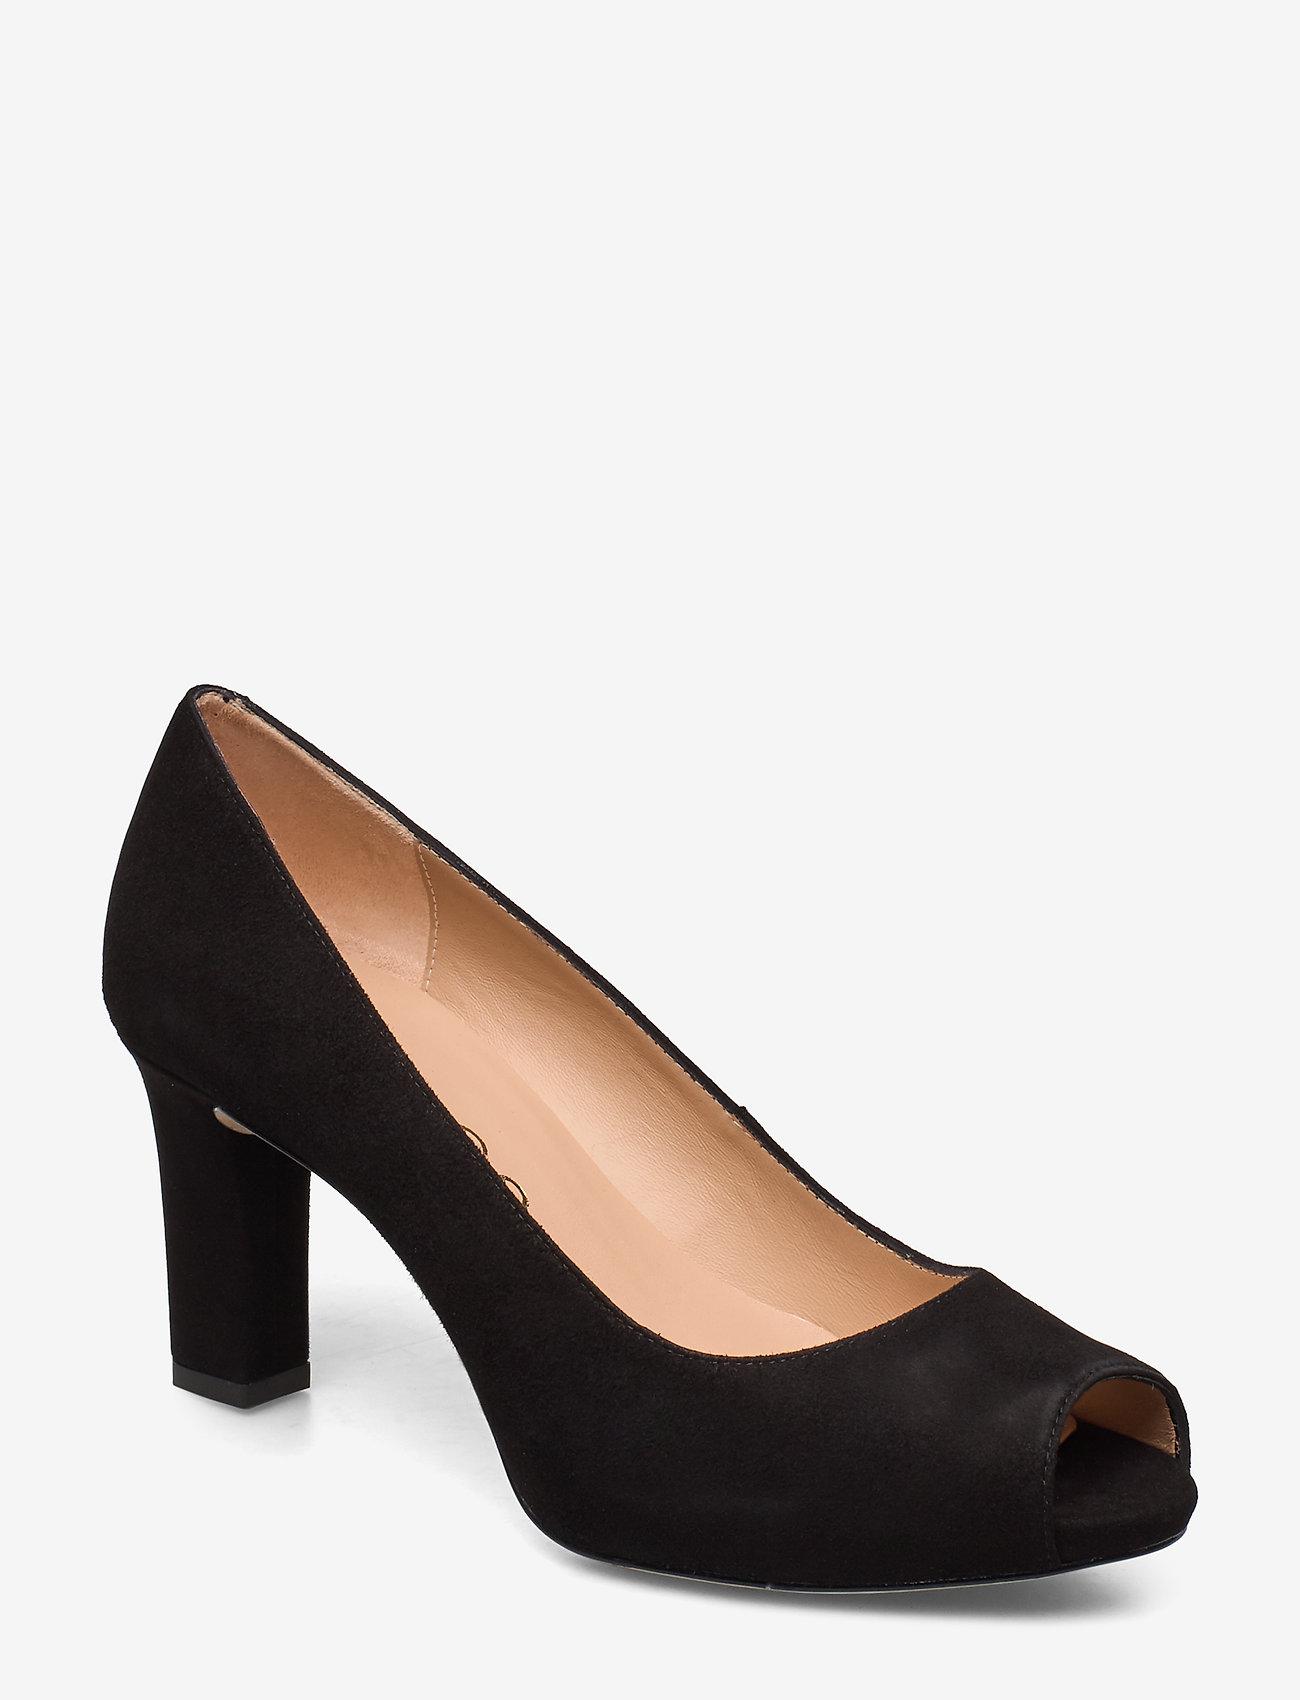 UNISA - NAZO_20_KS - szpilki peep toe - black - 0